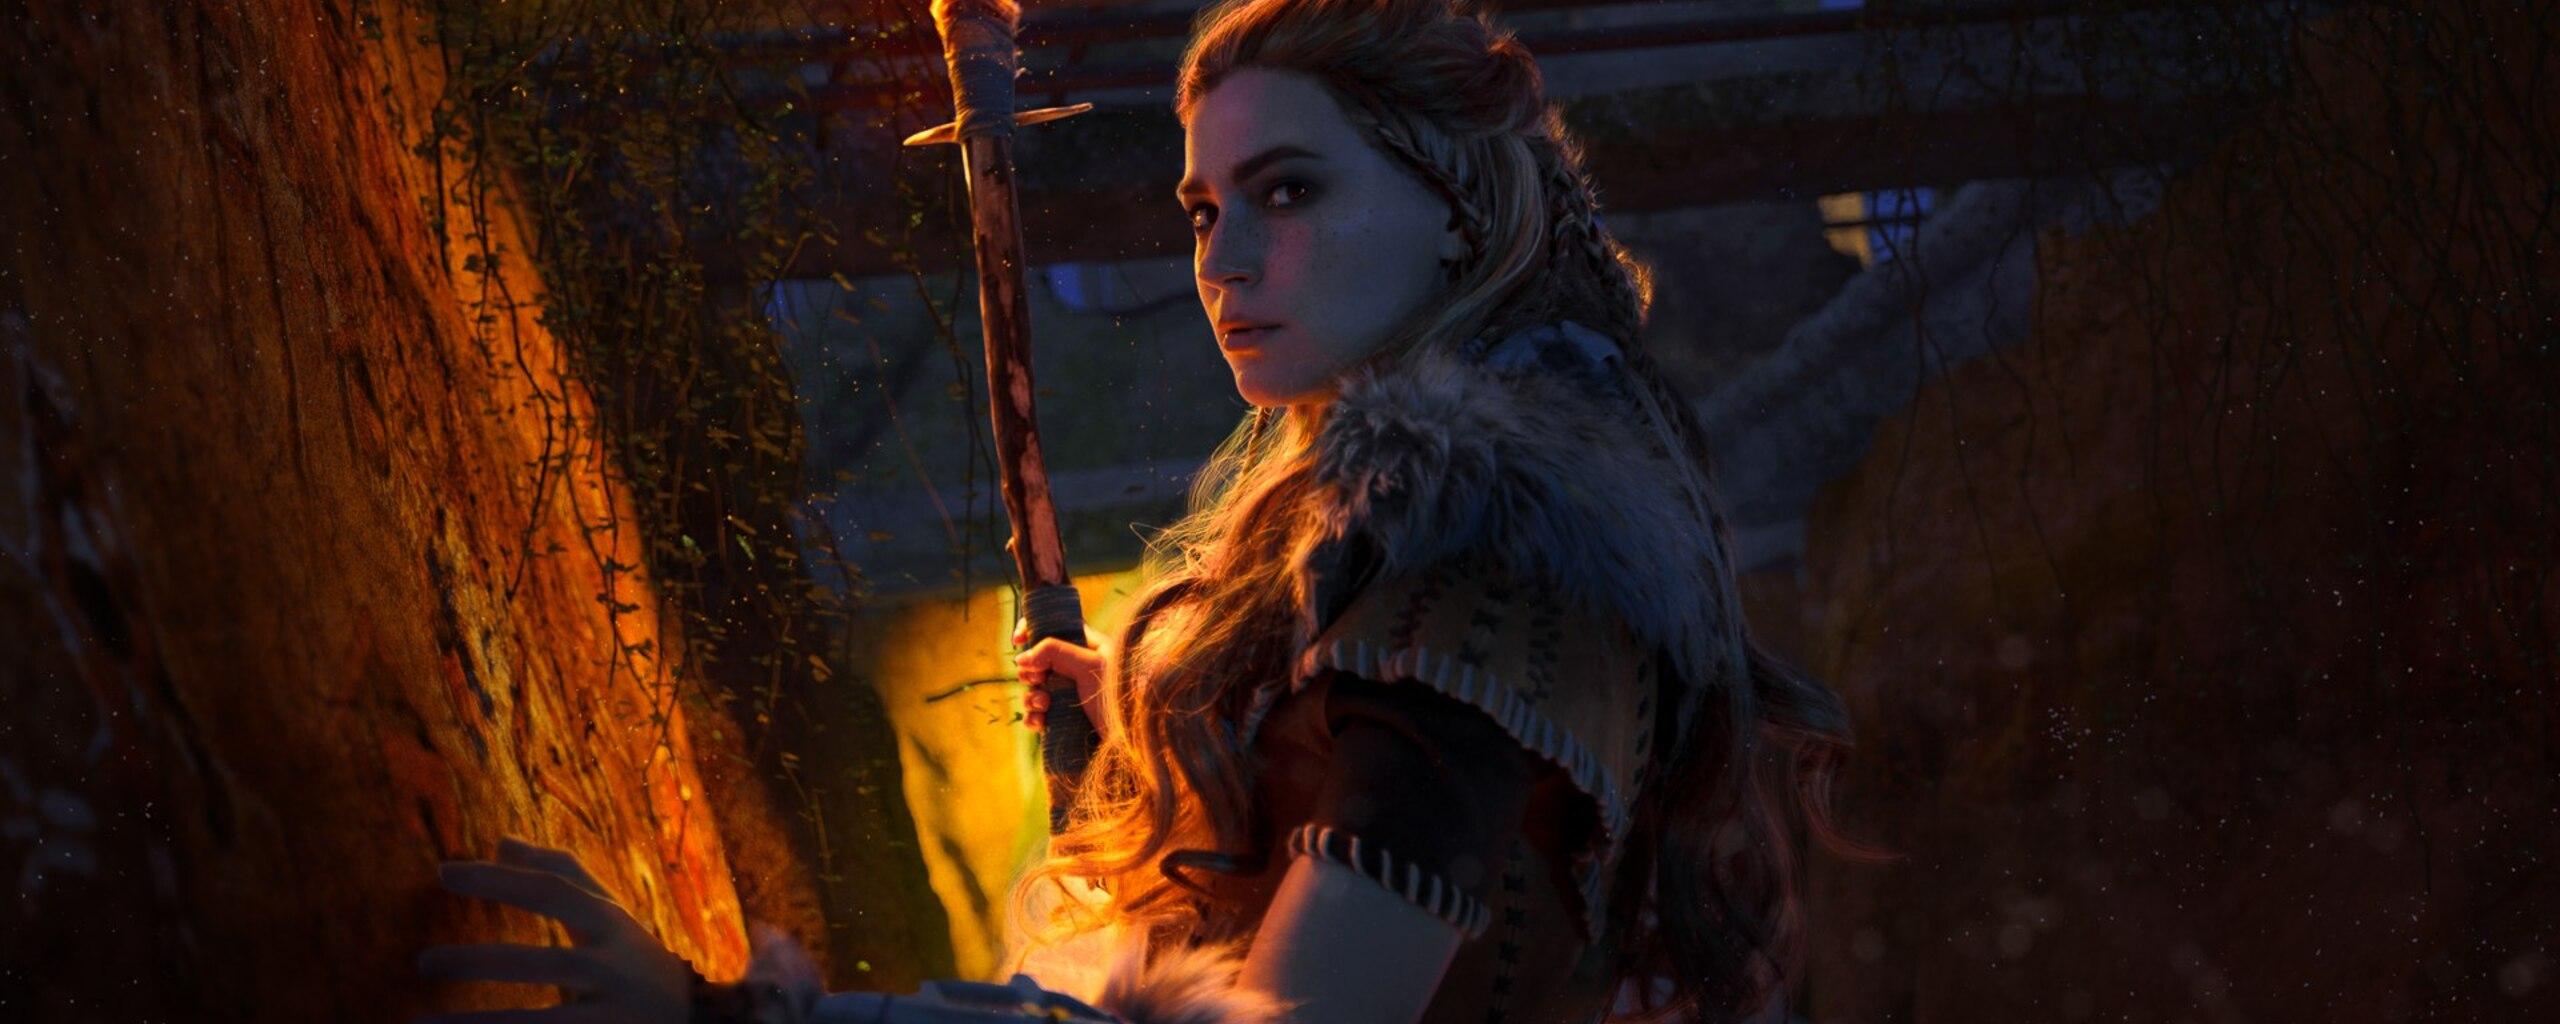 aloy-horizon-zero-dawn-game-cosplay-qhd.jpg